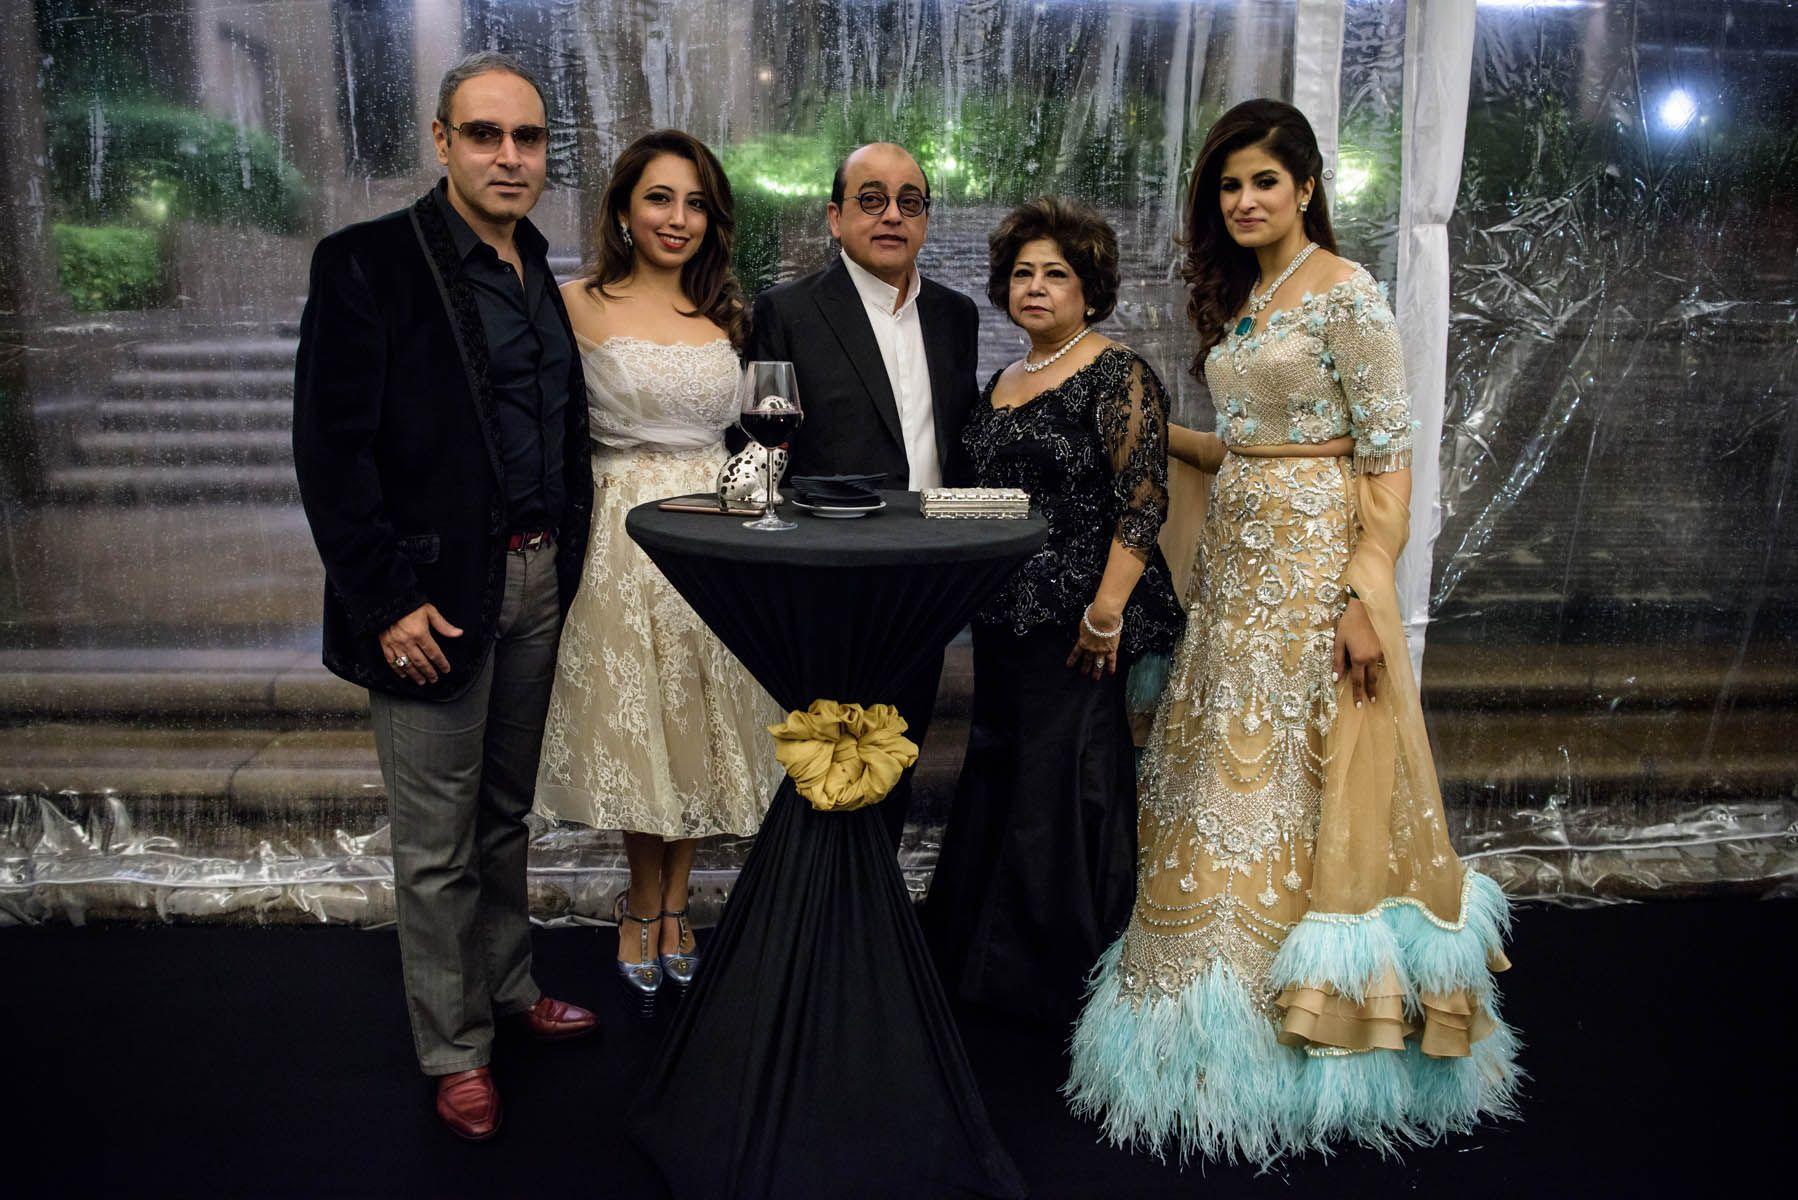 Sameer Aswani, Dimple Aswani, Ashok Hiranandani, Asha Hiranandani, Shazreh Rahman